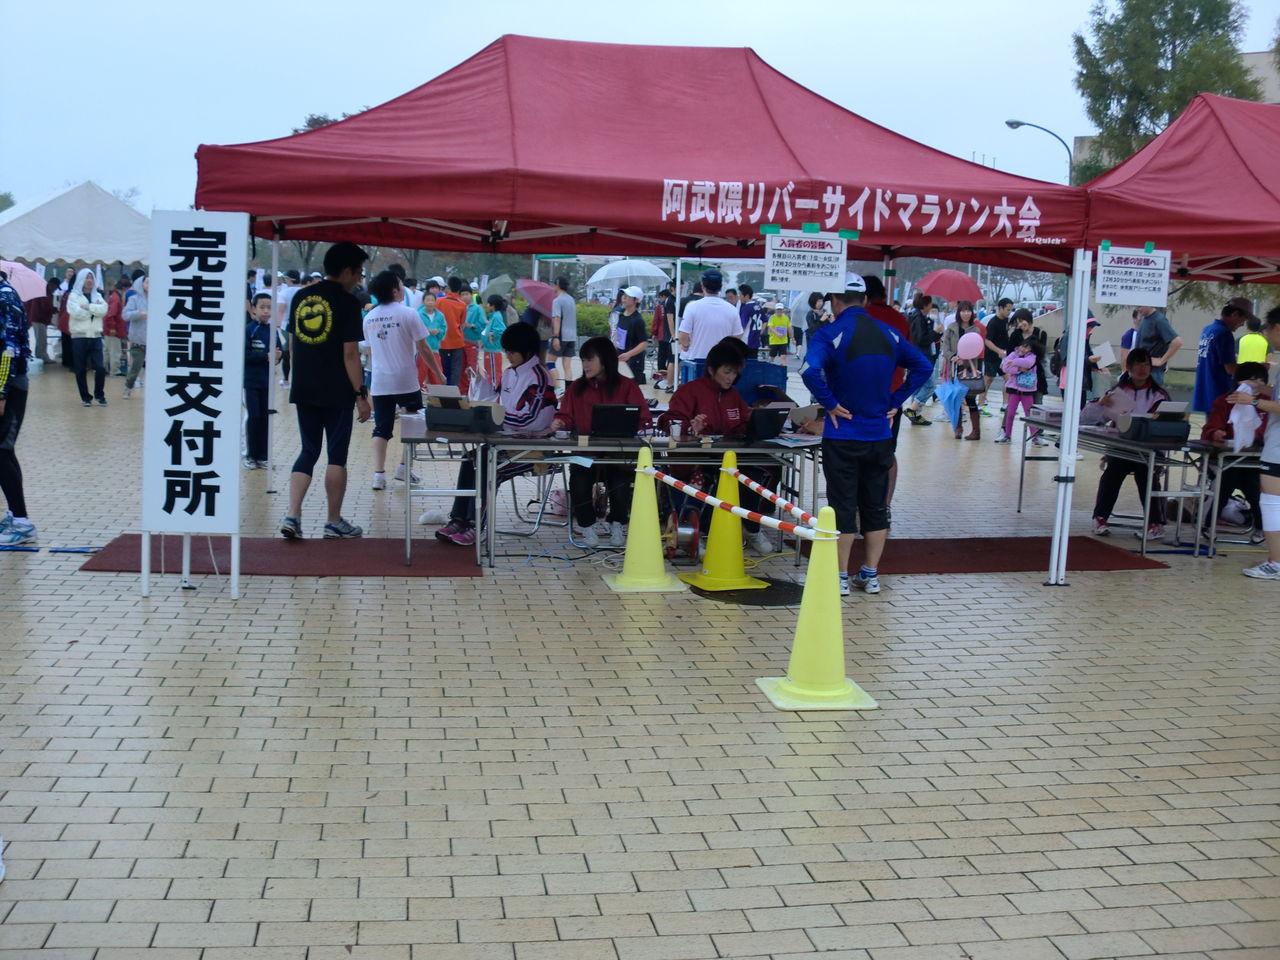 bbe789c984 マラソンタイム計測(タイムキーパー)のブログ : 第24回阿武隈 ...